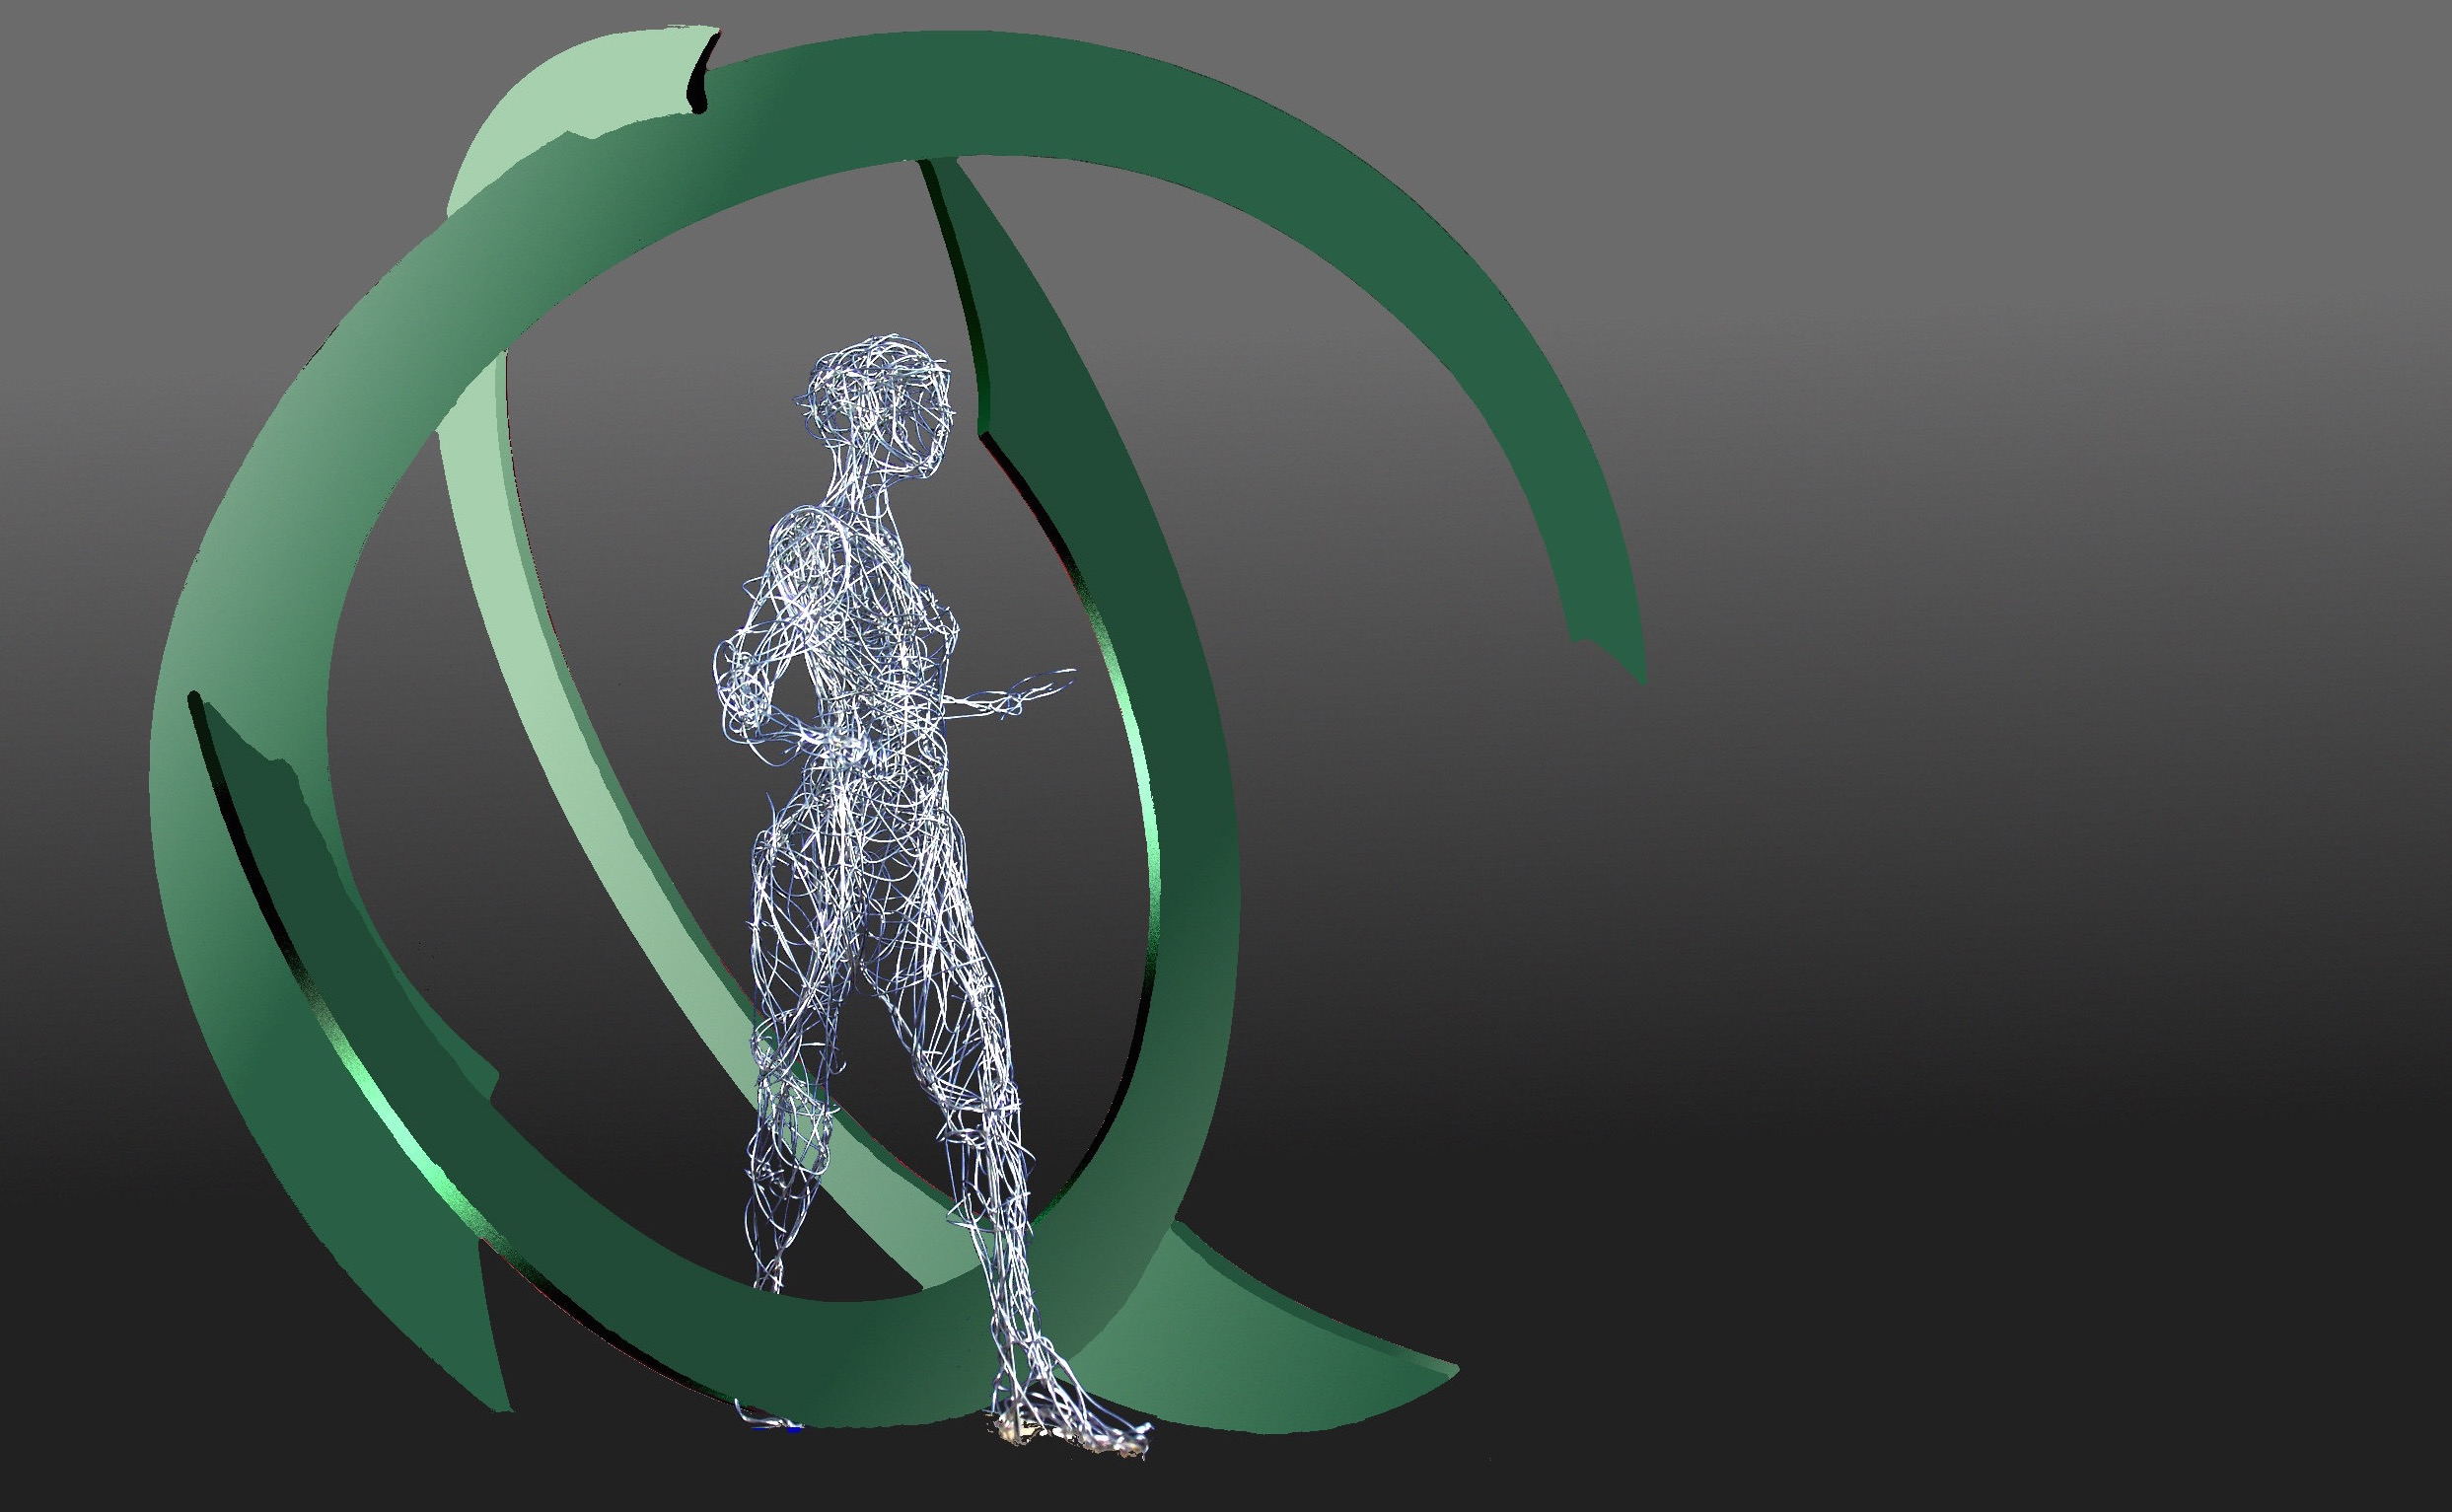 """Cycles of Life"" (Modell), Edelstahl, Edelstahldraht, 180 x 180 x 165 cm, 2010"